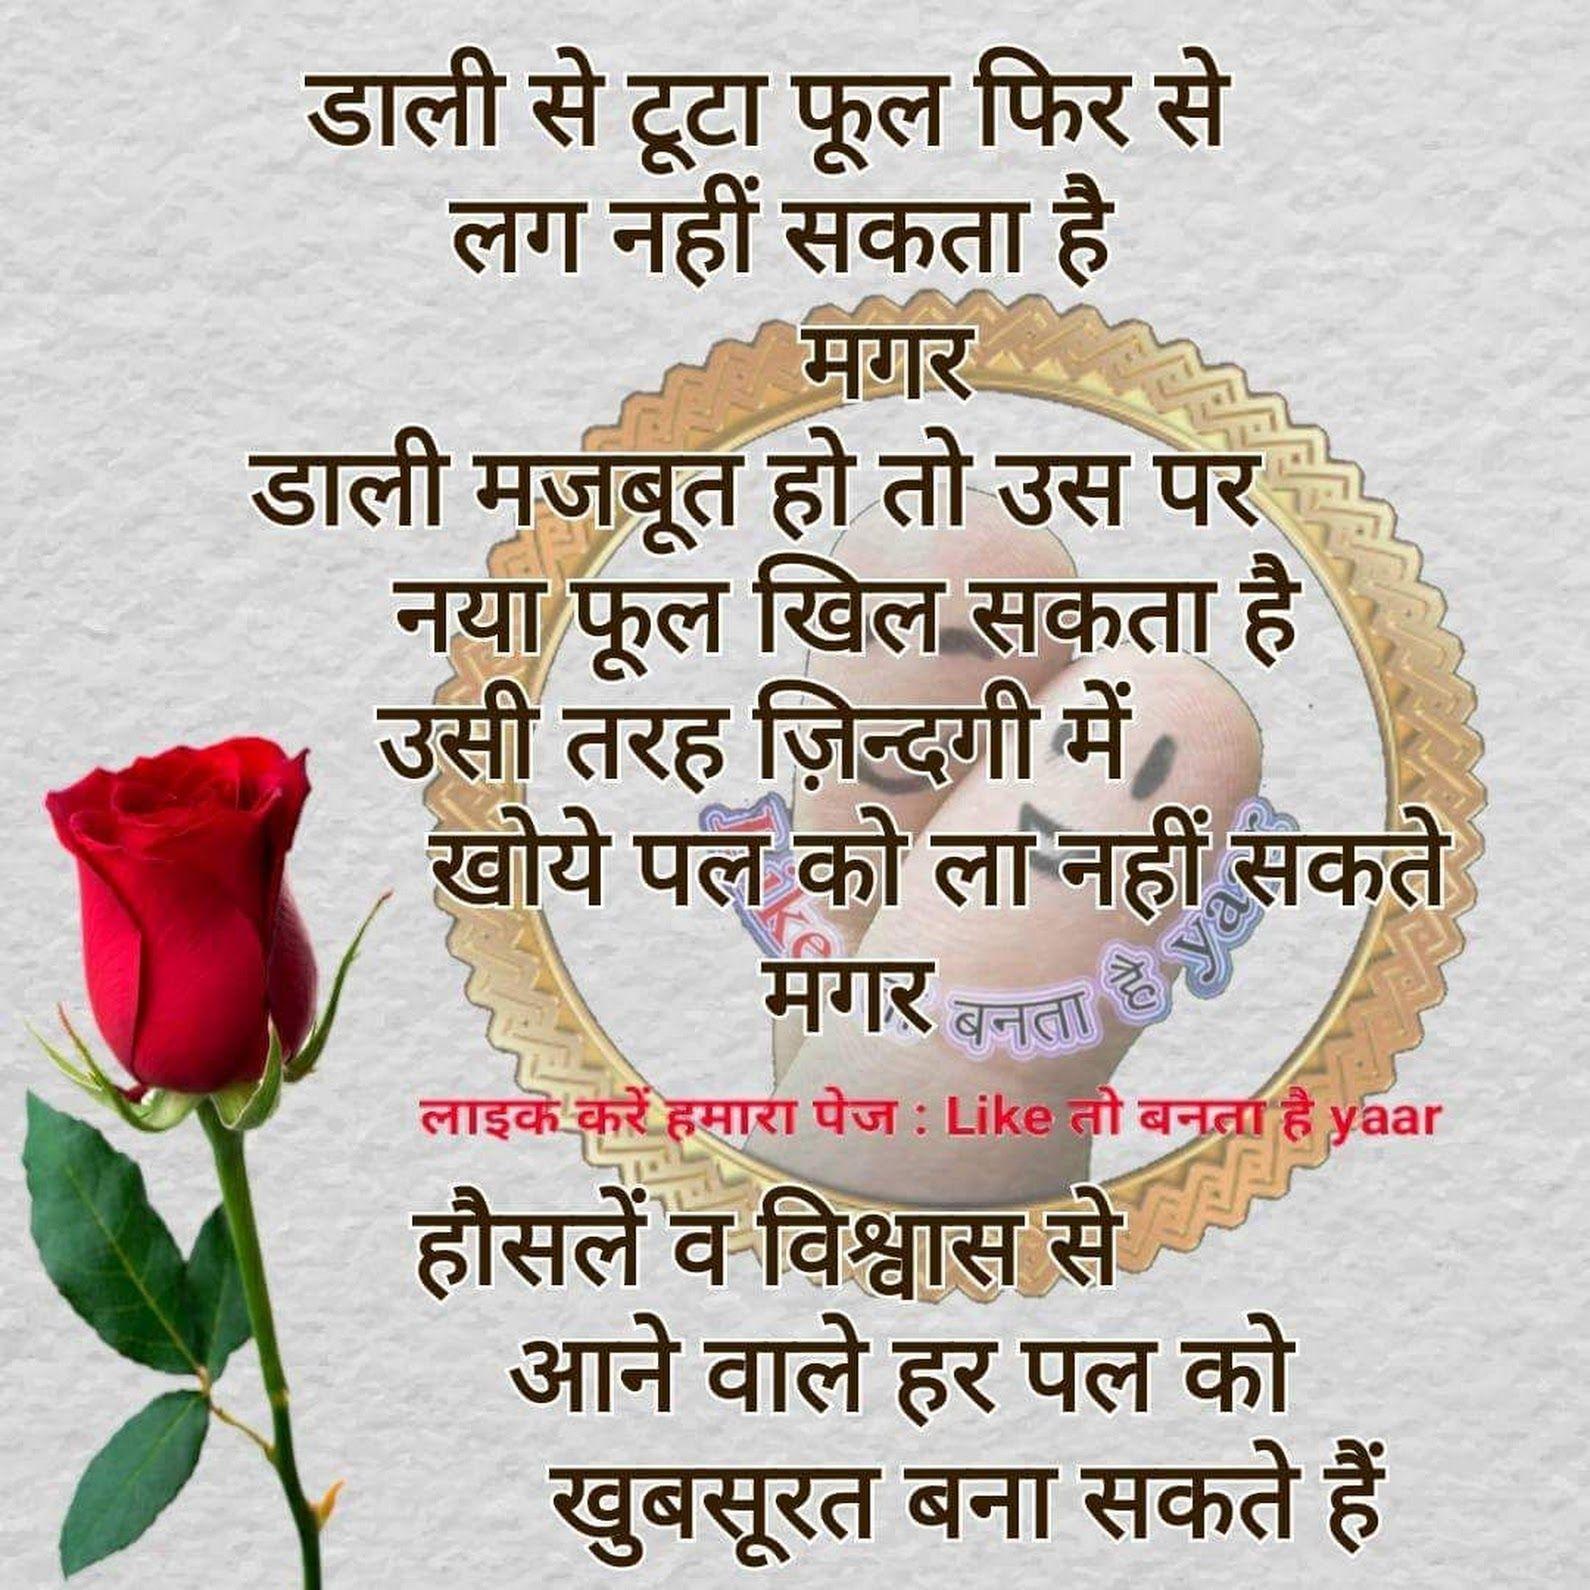 Positive Thinking Quotes Hindi: Photo Quotes, Morning